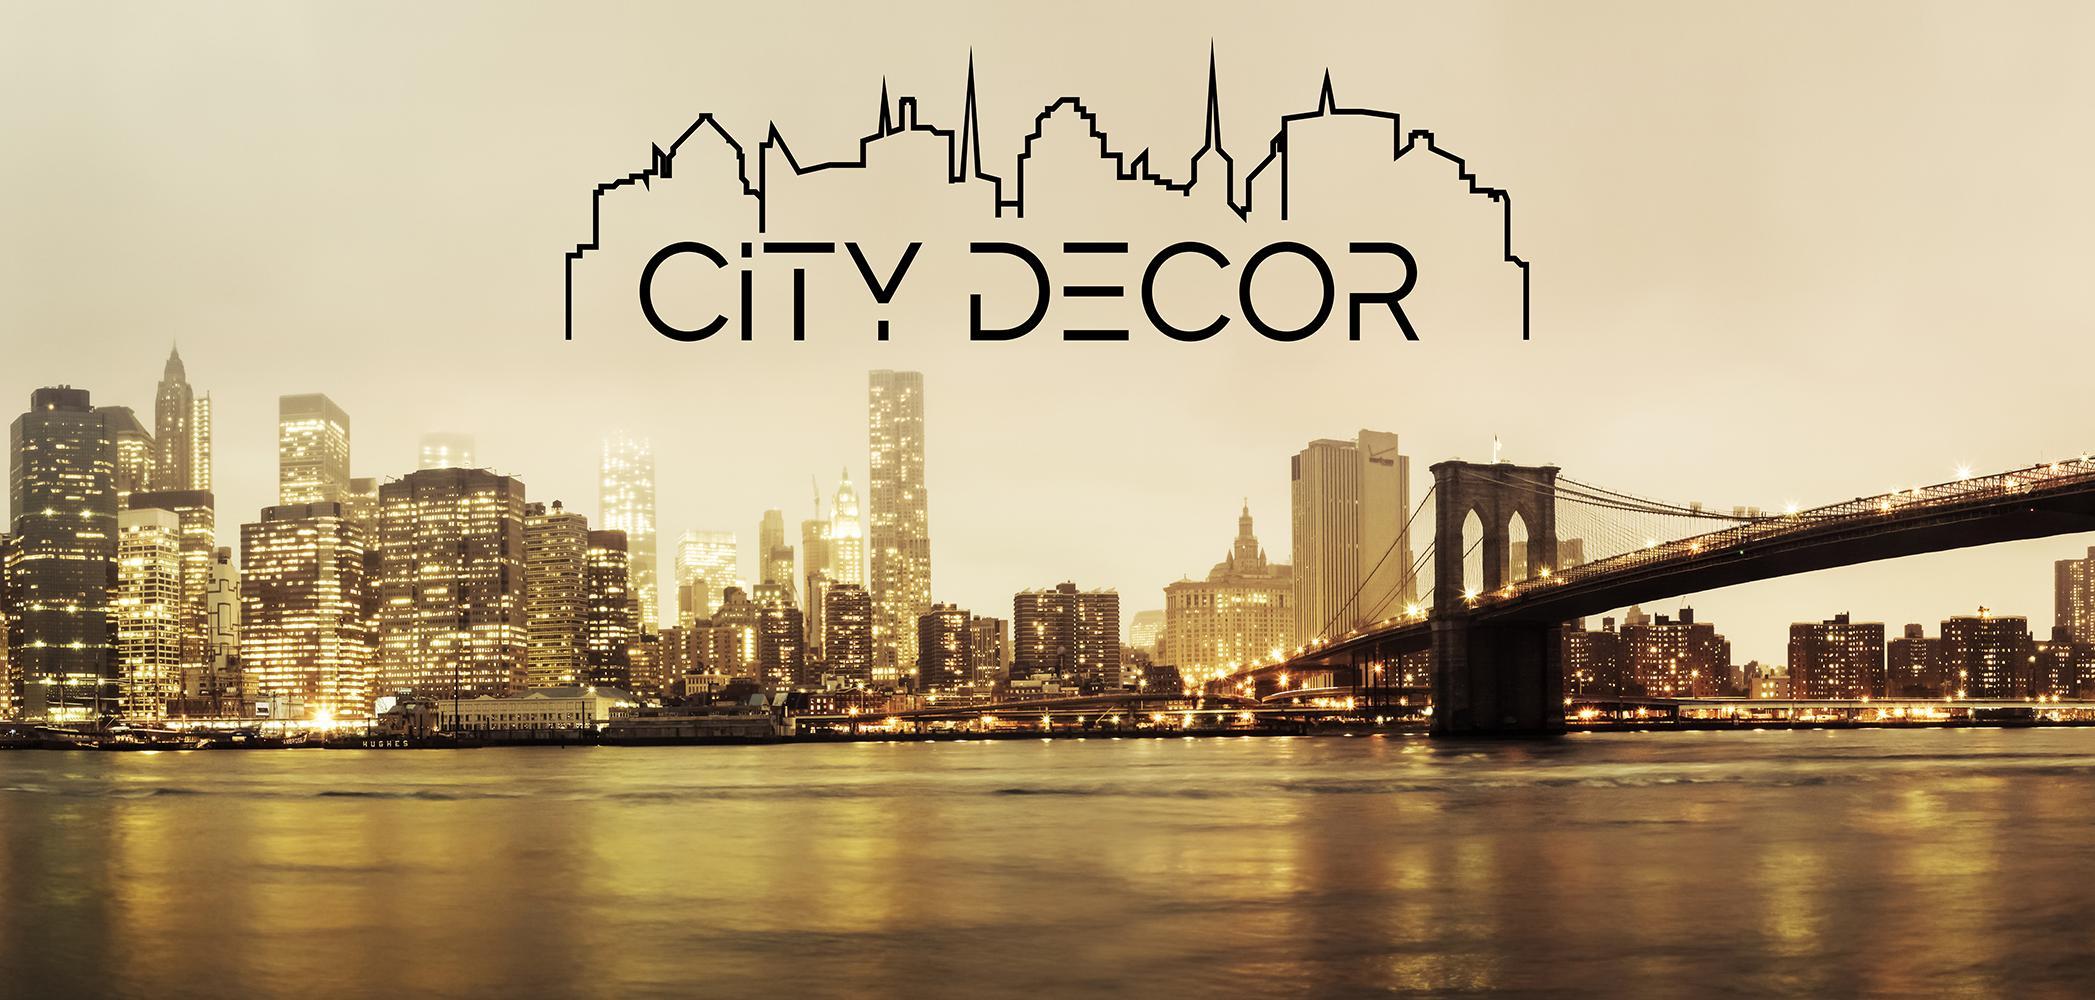 Citydecor | Ситидекор